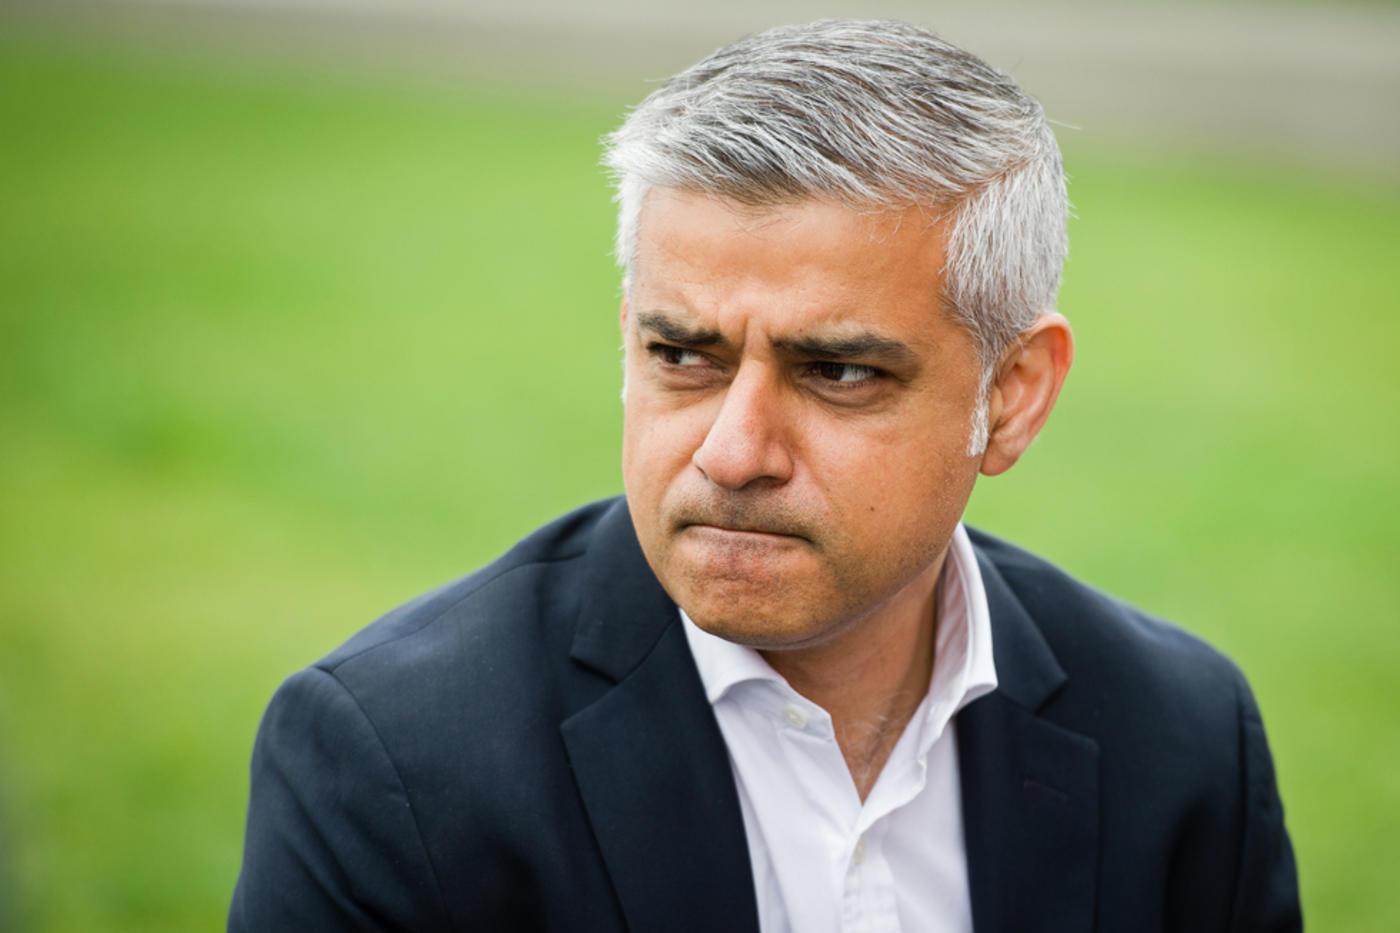 Sadiq Khan: London's Muslim Zionist mayor | Middle East Eye